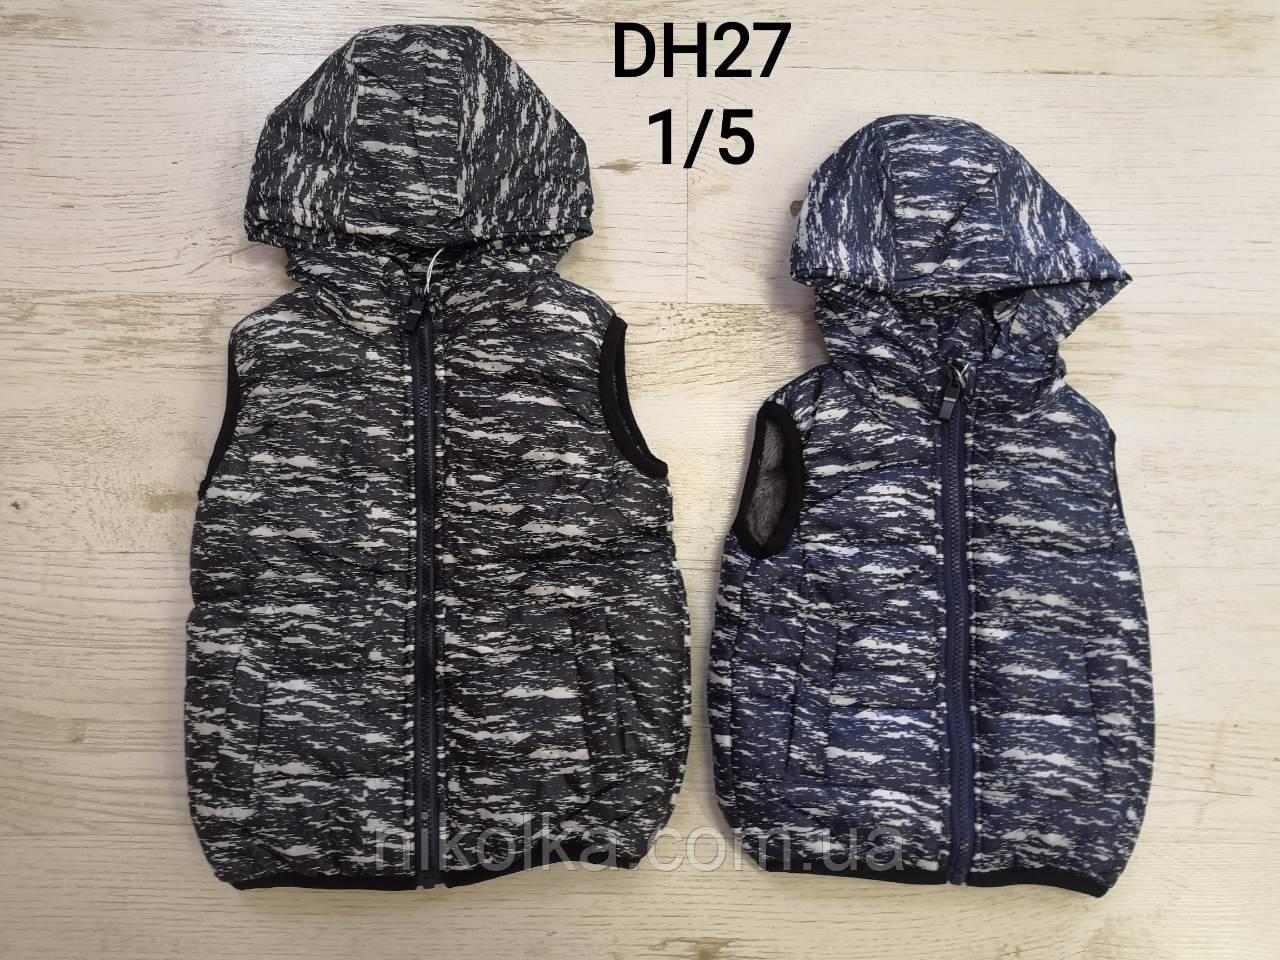 Безрукавки на меху для мальчика оптом, Sincere, 1-5 лет, арт. DH27